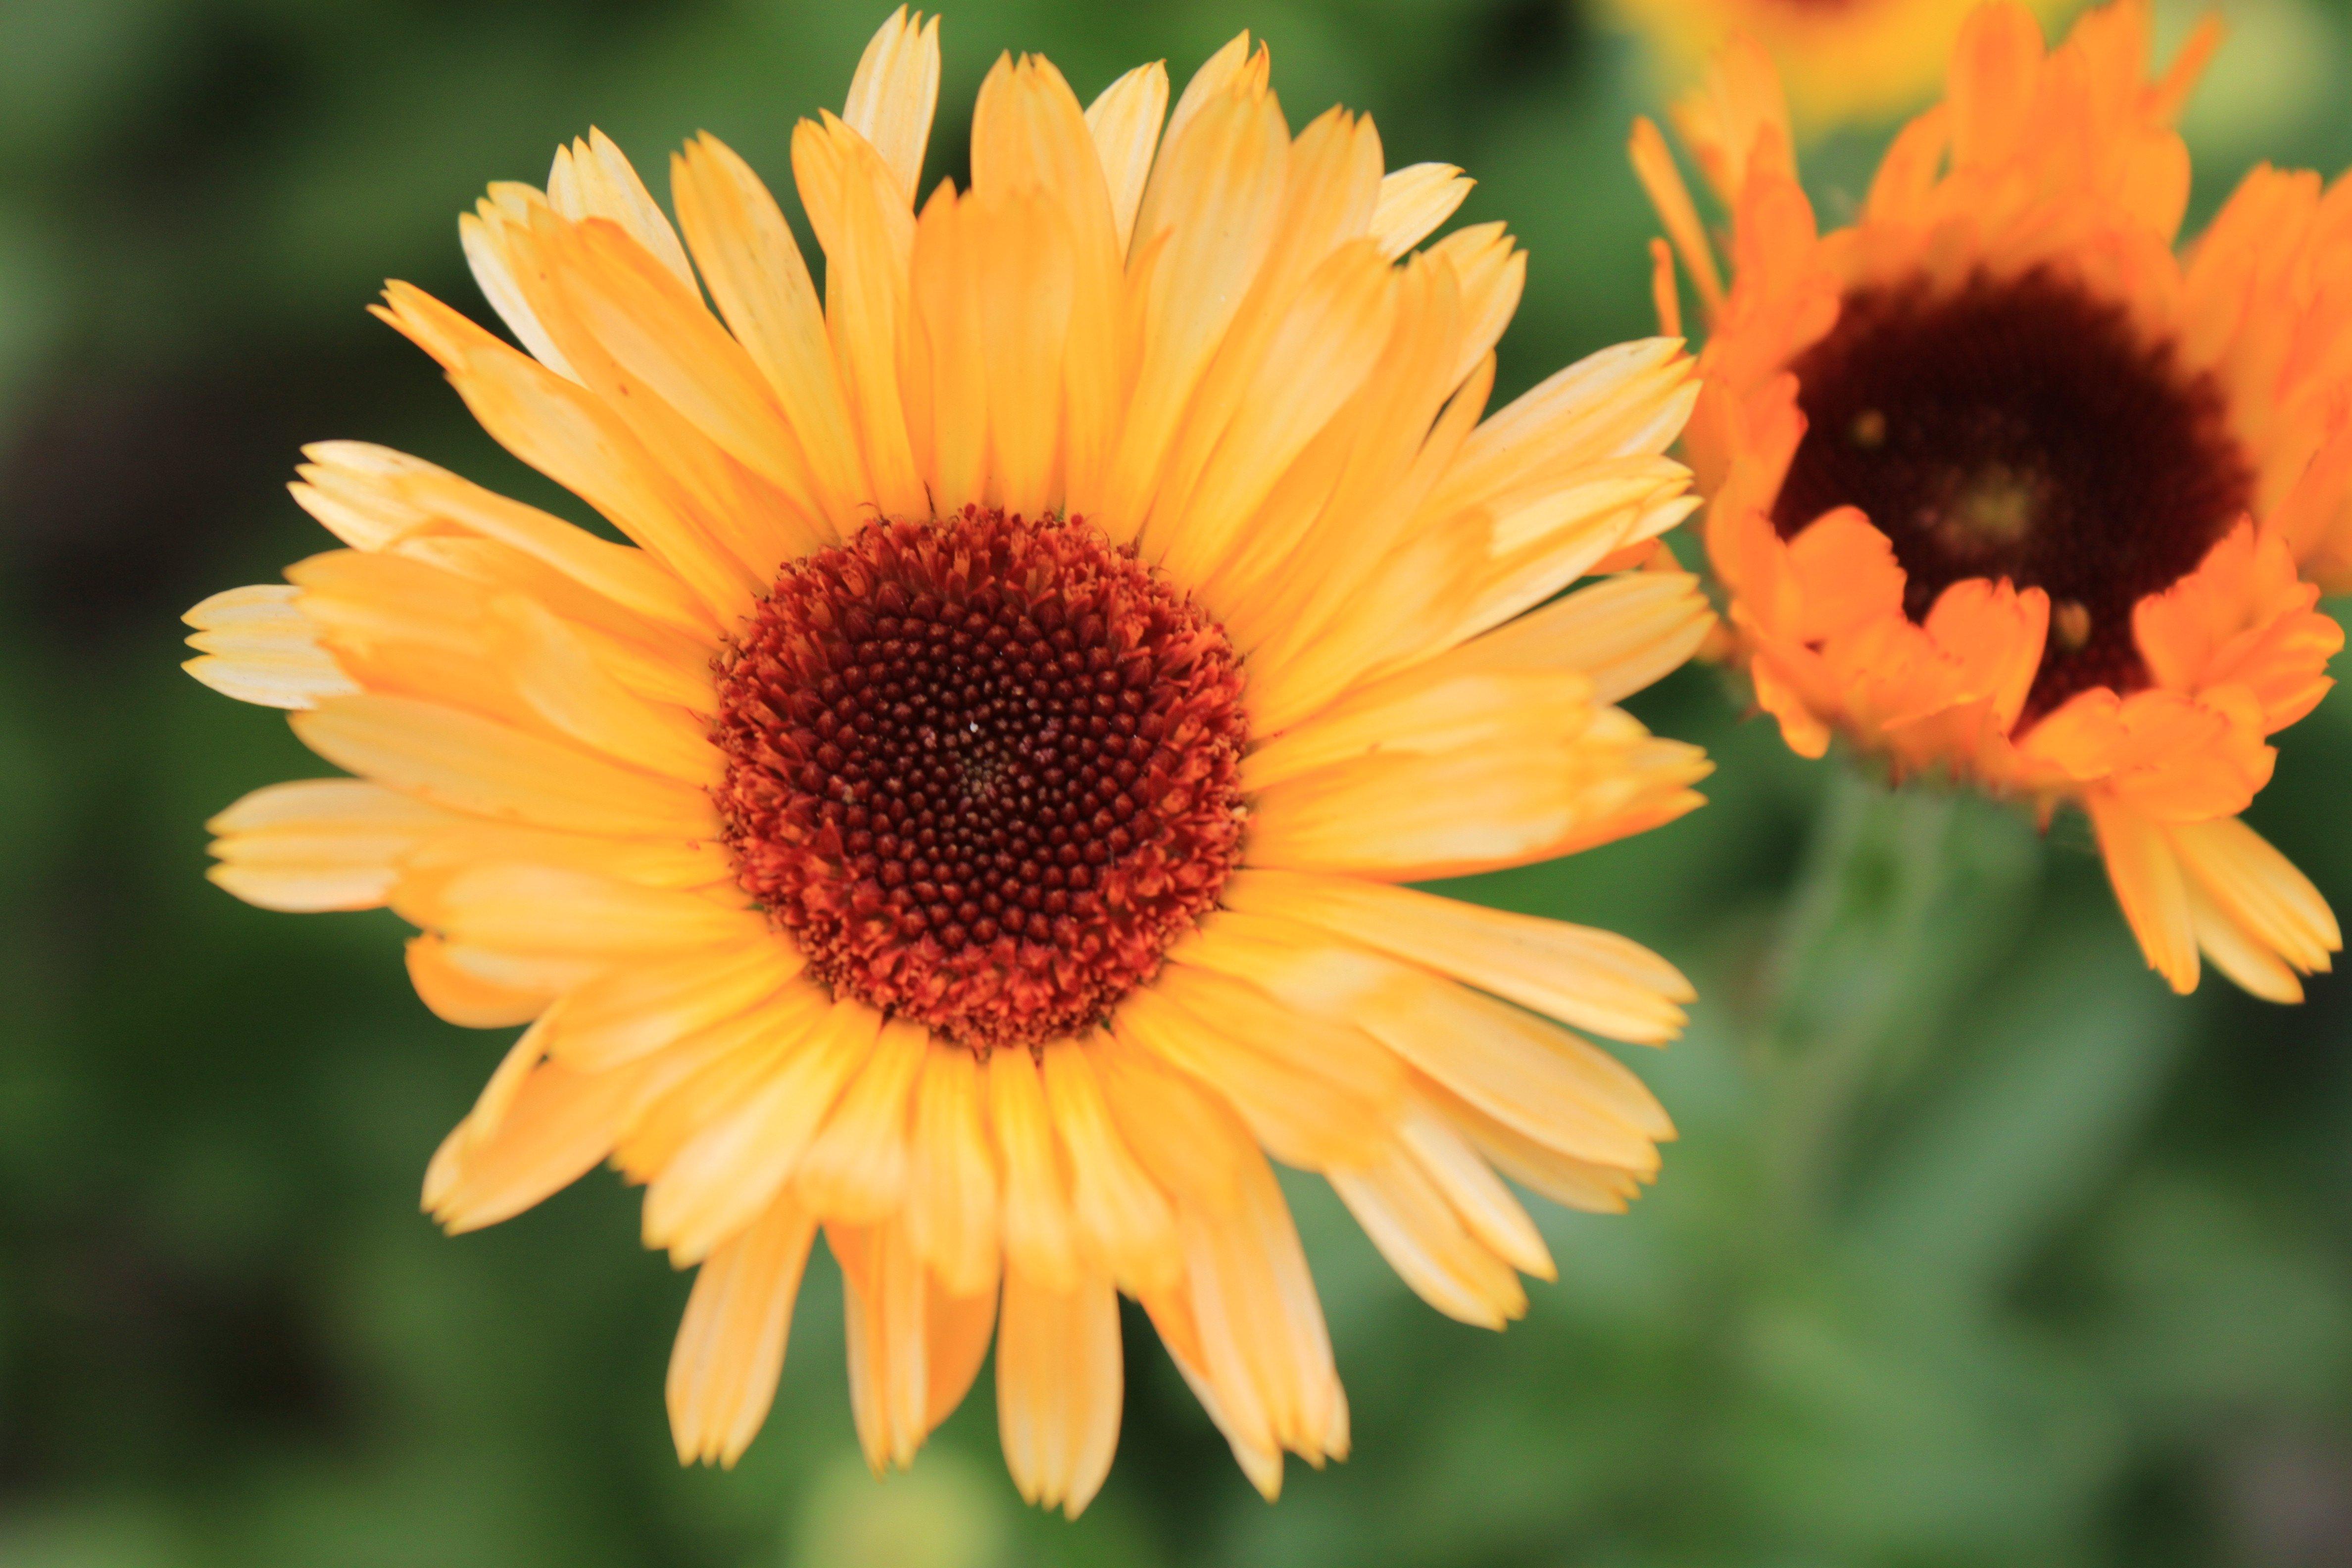 Flor de calêndula no seu auge de beleza ©Gabriela Pastro